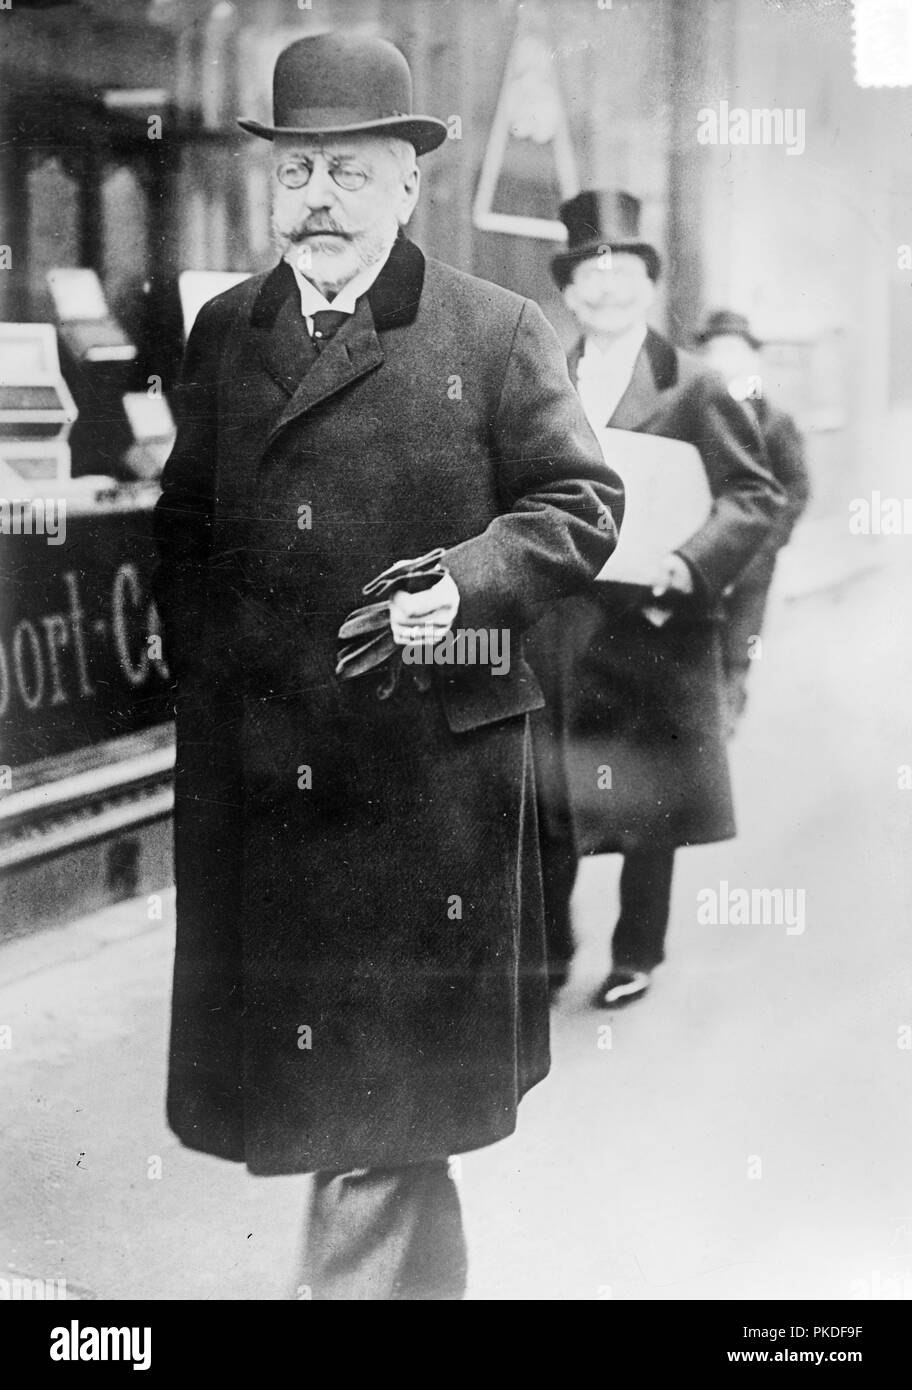 Baron Stephan Burian, Stephan Burián von Rajecz (1851 – 1922), Baron von Burian or Count Burian, Austro-Hungarian politician - Stock Image